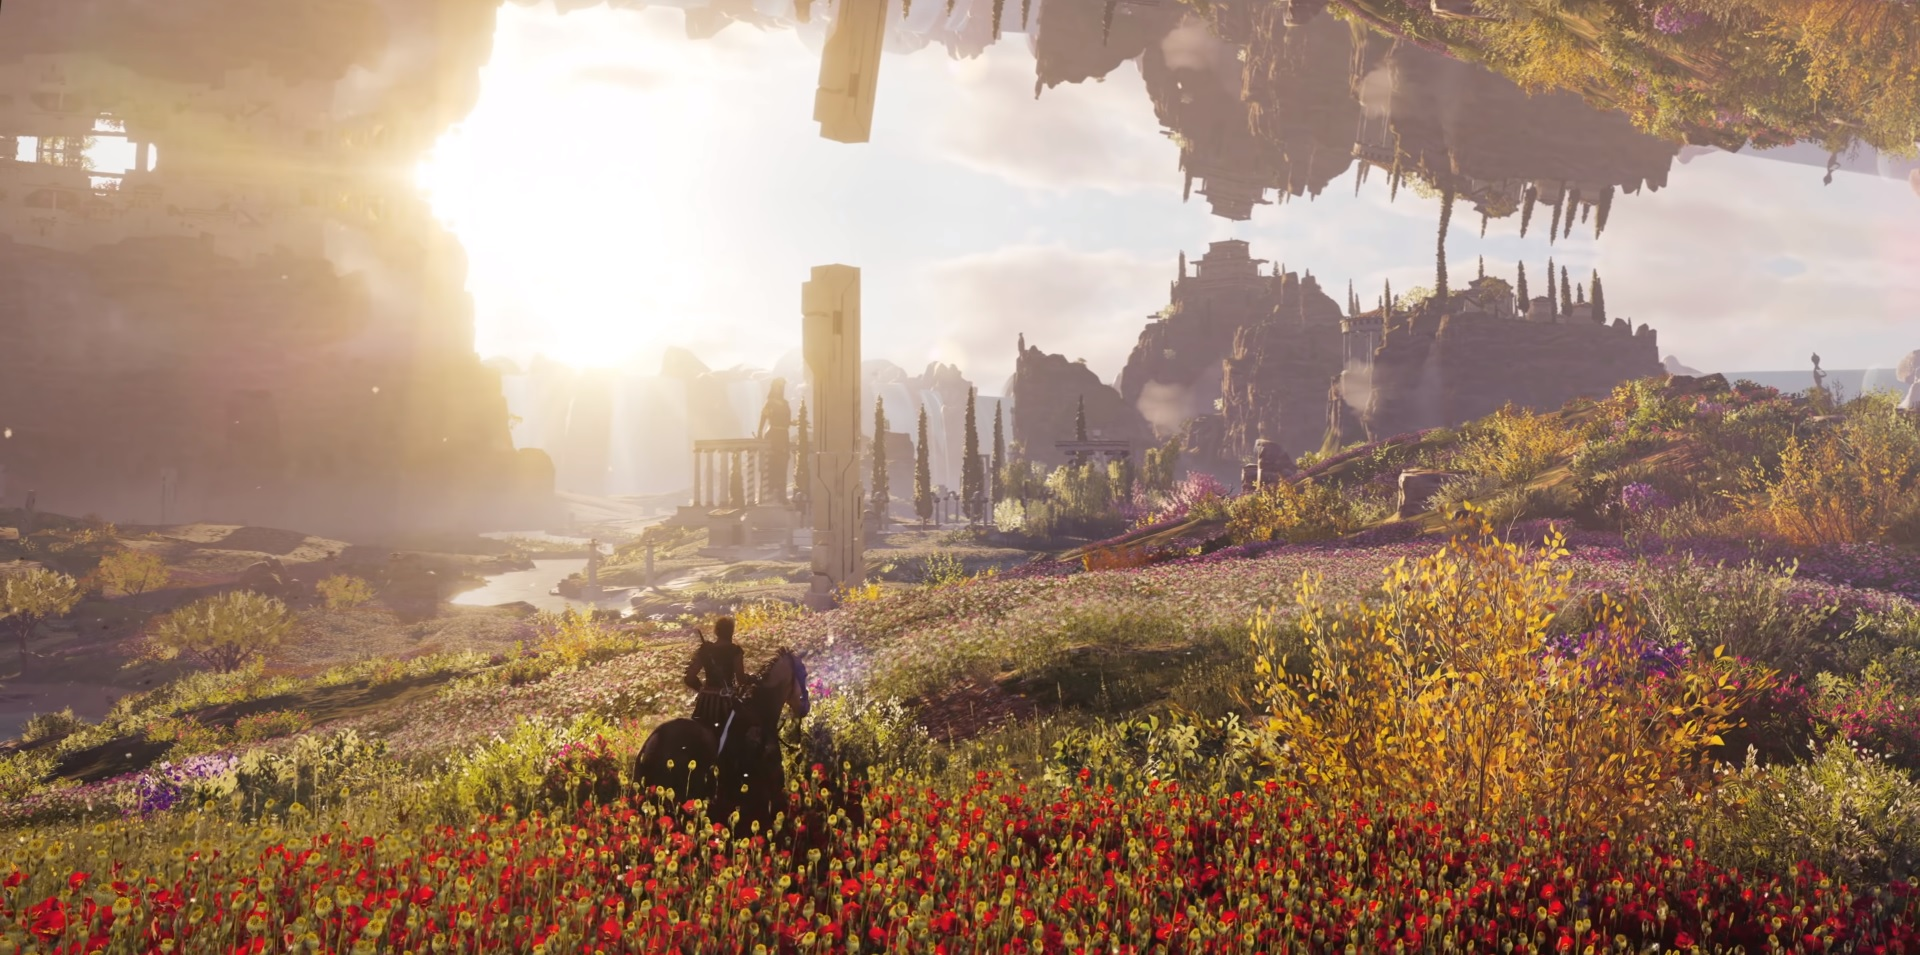 Assassin's Creed Odyssey's Fate of Atlantis DLC looks wild but not wet screenshot